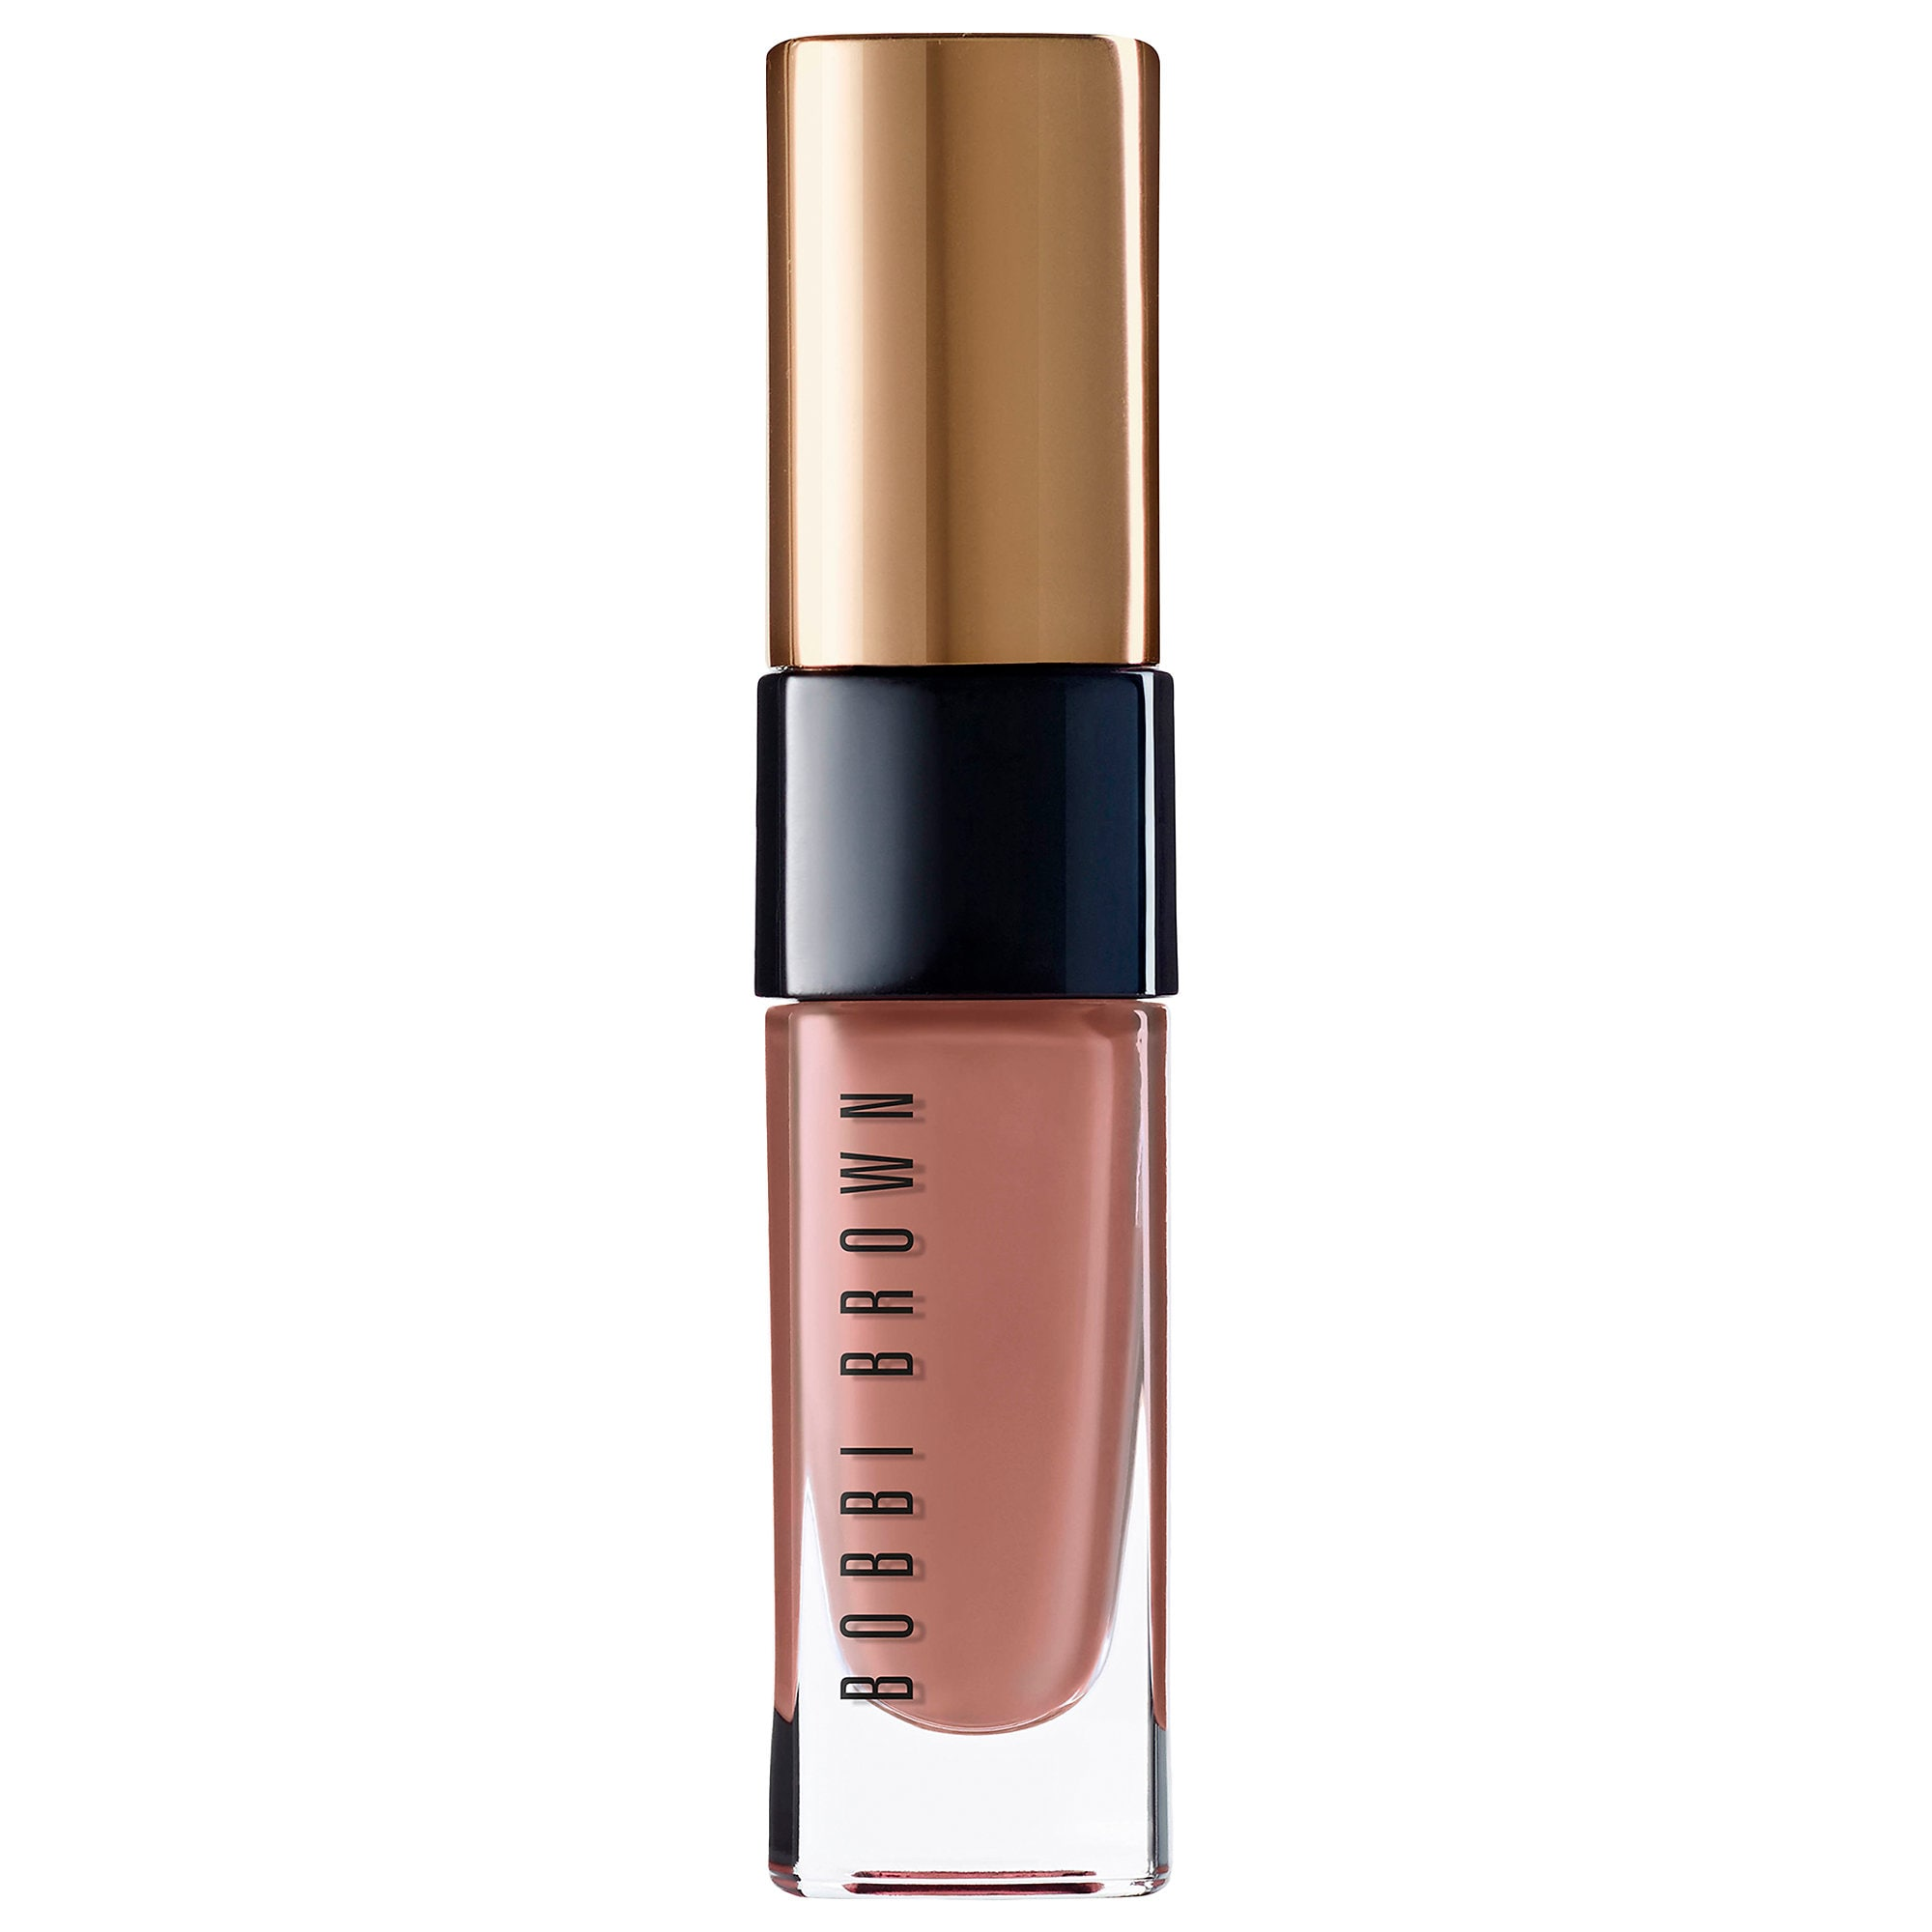 Luxe Liquid Lip Color - Barely Nude